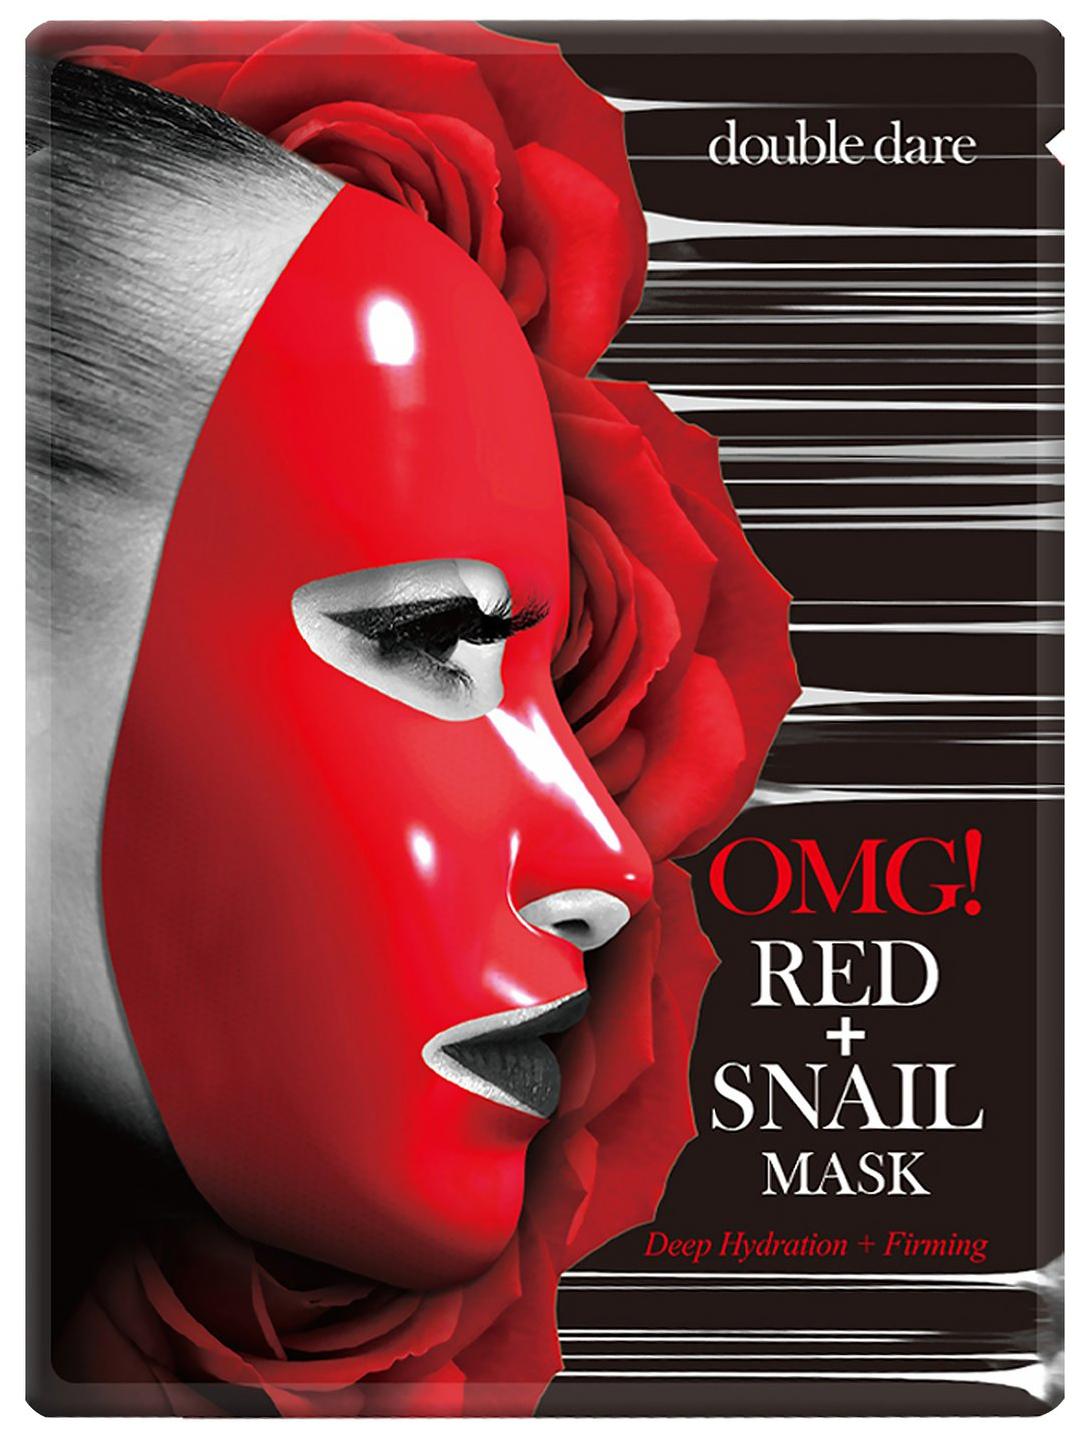 Купить Маска для лица Double Dare OMG! Red + Snail Mask